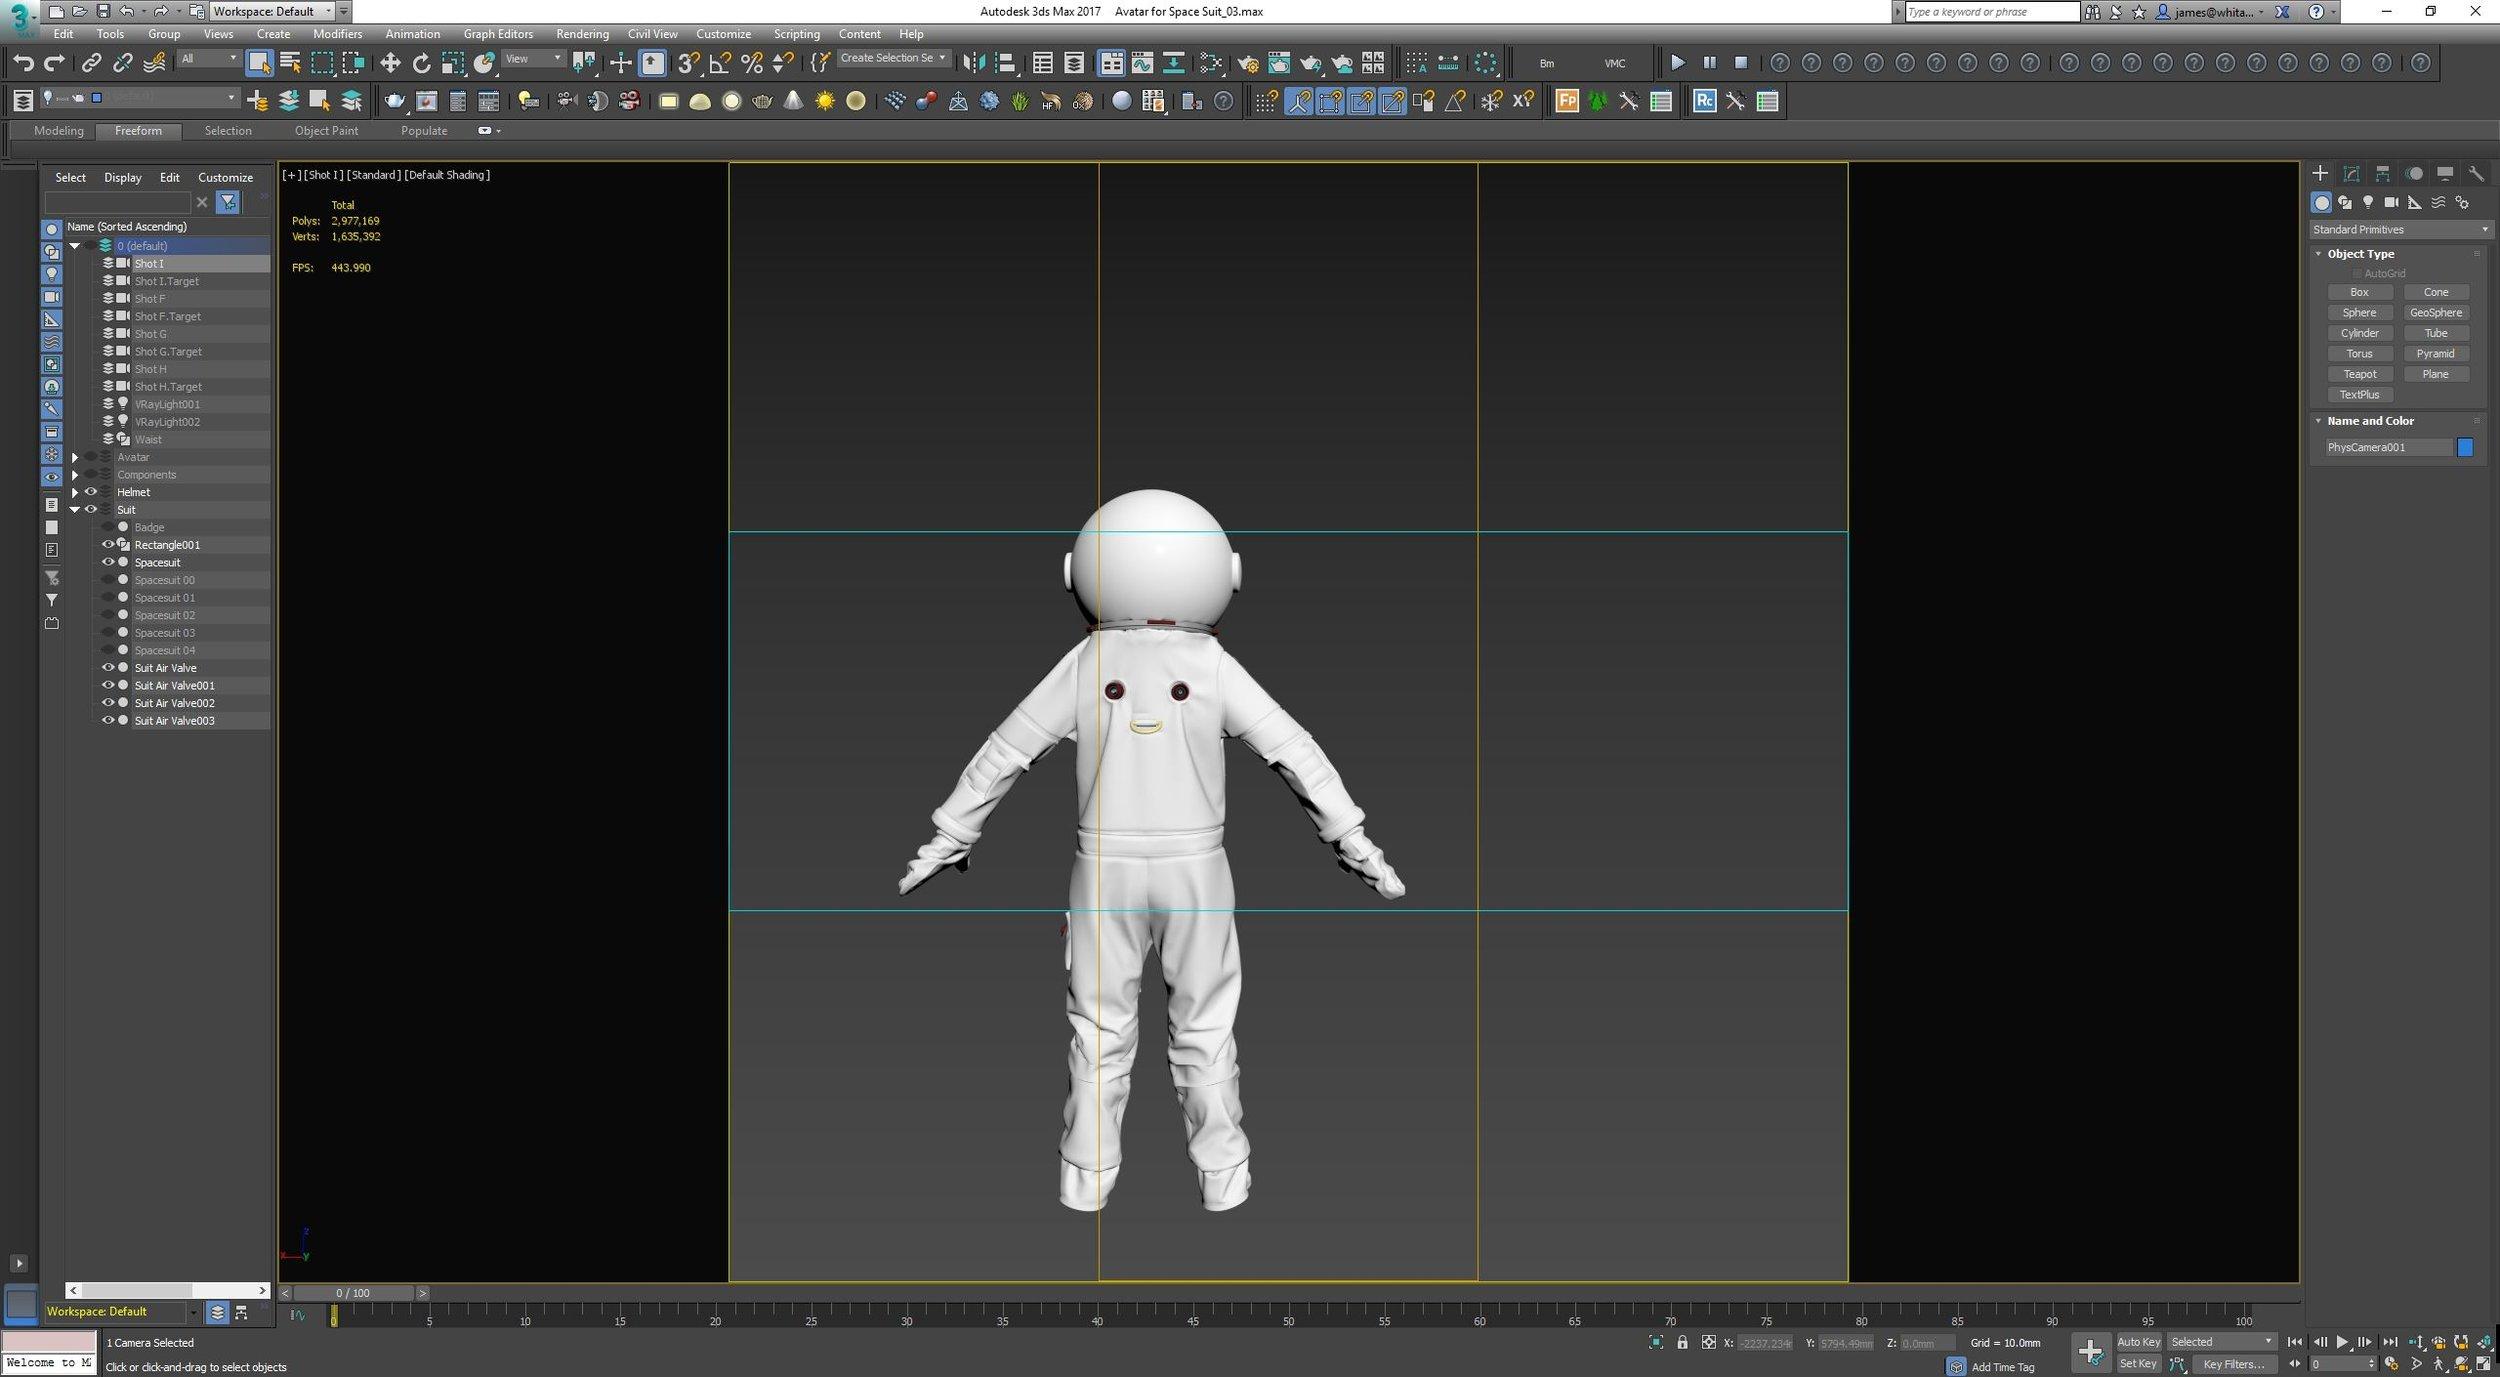 Screen grab of Space Suit Development